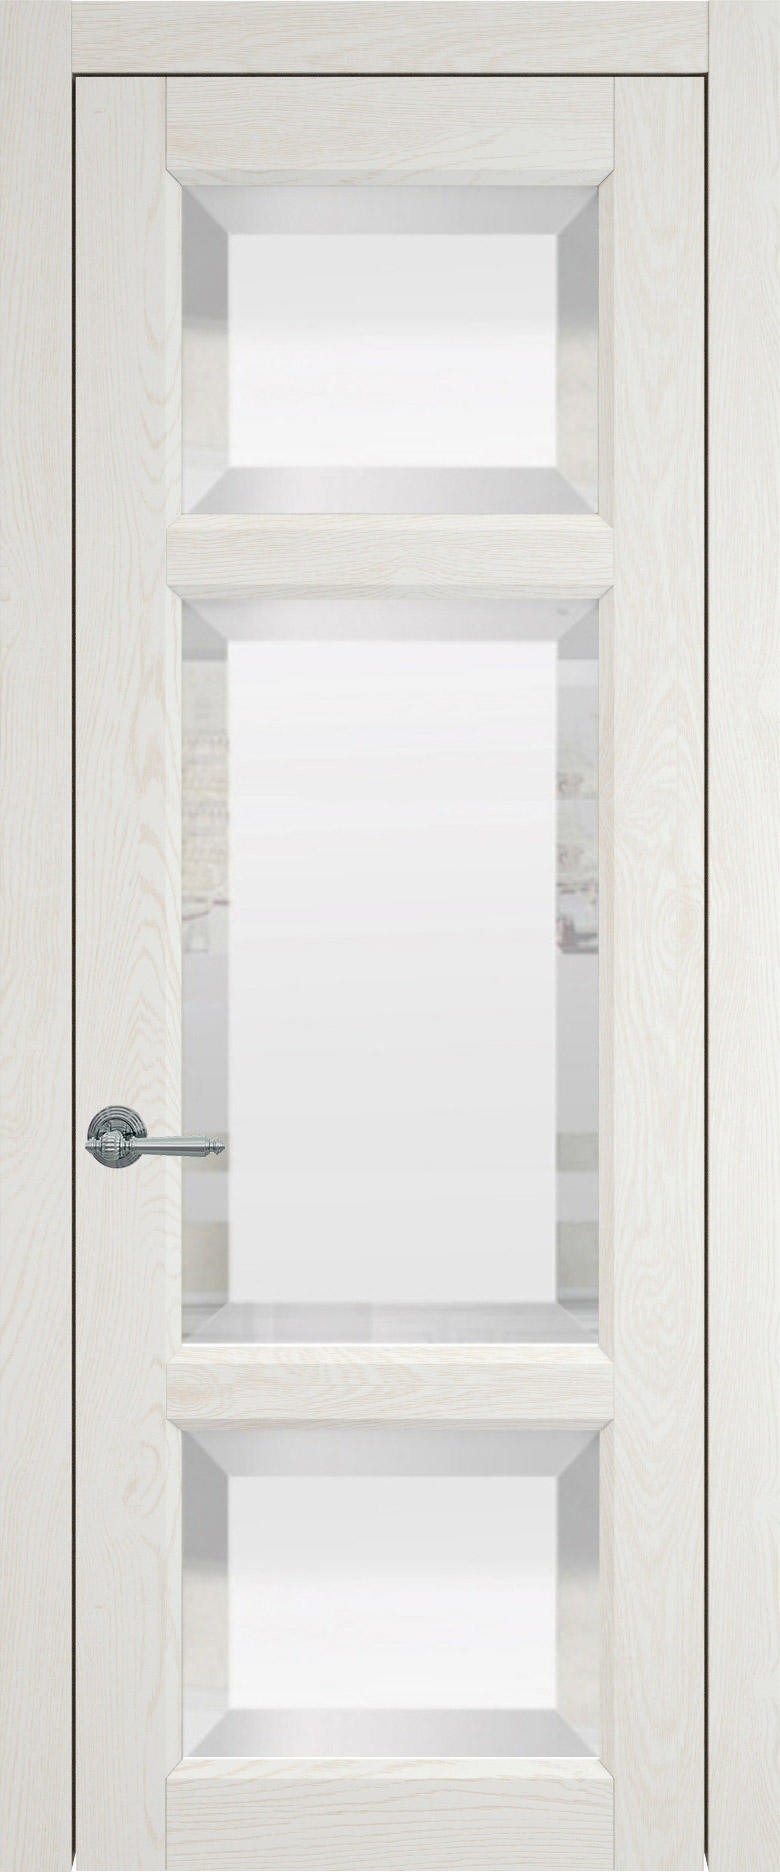 Siena цвет - Белый ясень (nano-flex) Со стеклом (ДО)